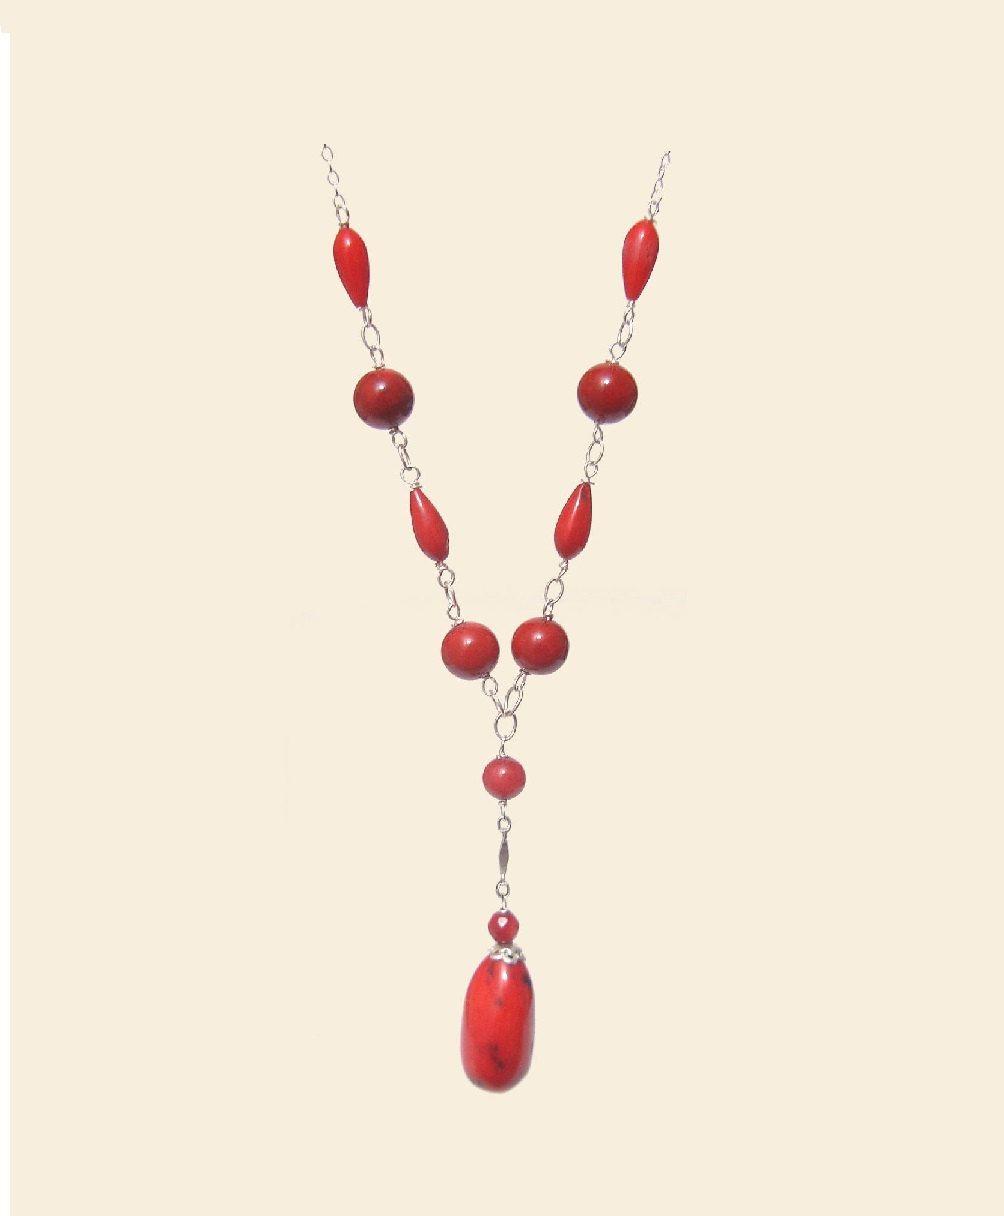 Red irregular coral necklace natural stones 925 sterling silver red irregular coral necklace natural stones 925 sterling silver necklace handmade healing chakra aloadofball Choice Image